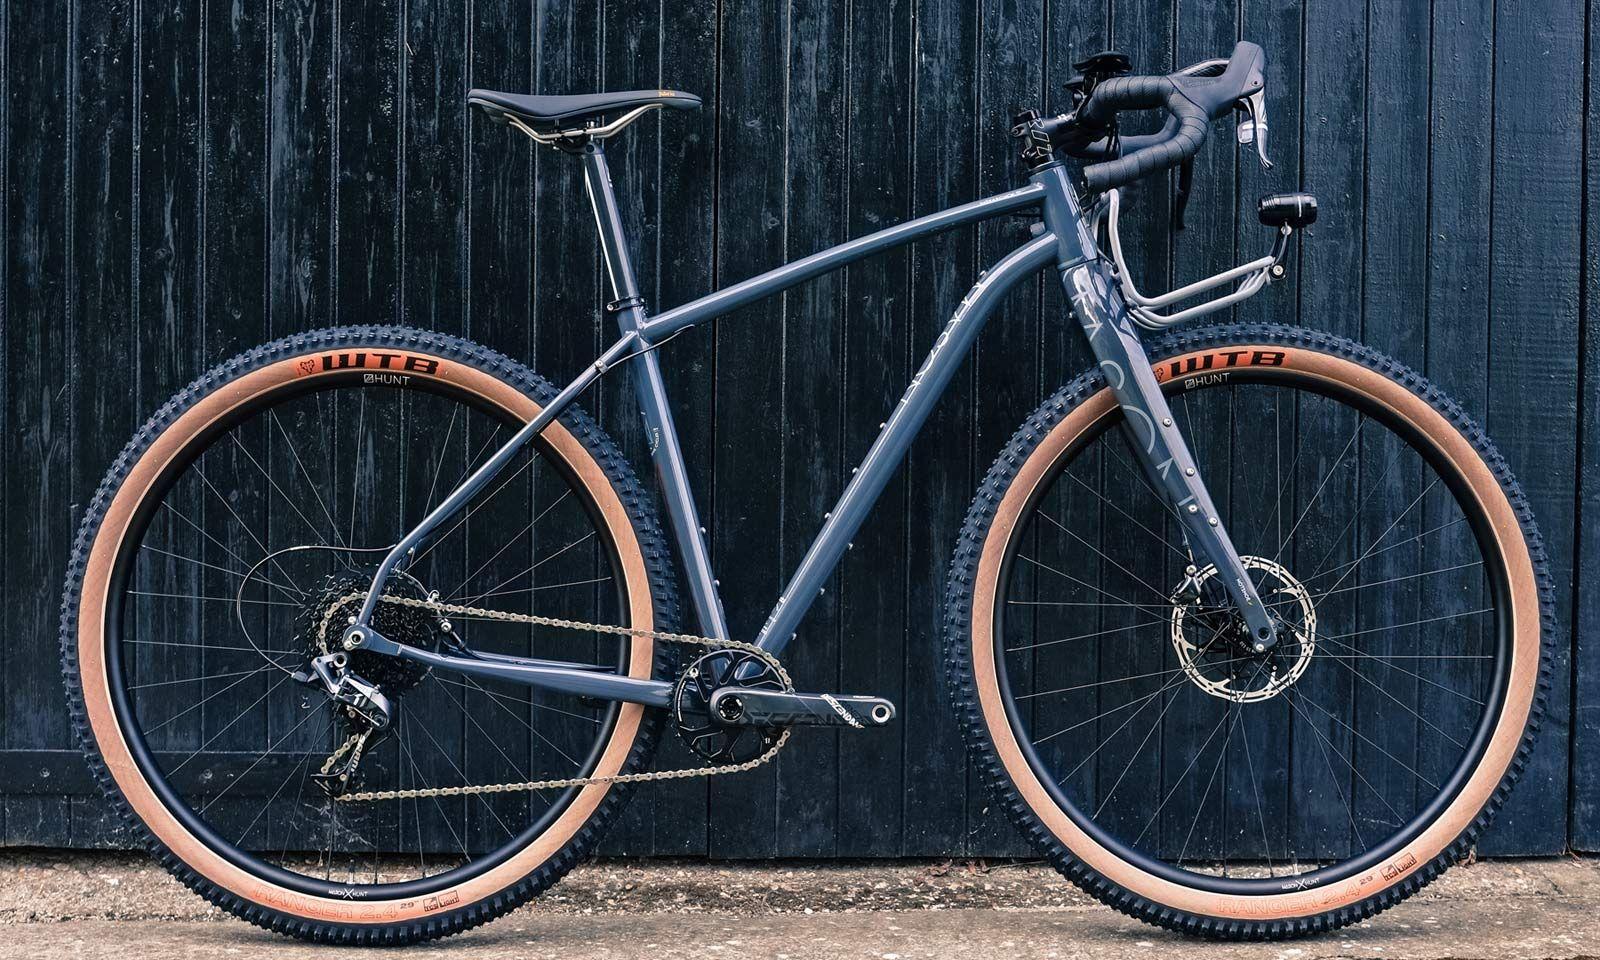 Mason Aspect New Titanium Road Bike Plus Alternate Iso Off Road